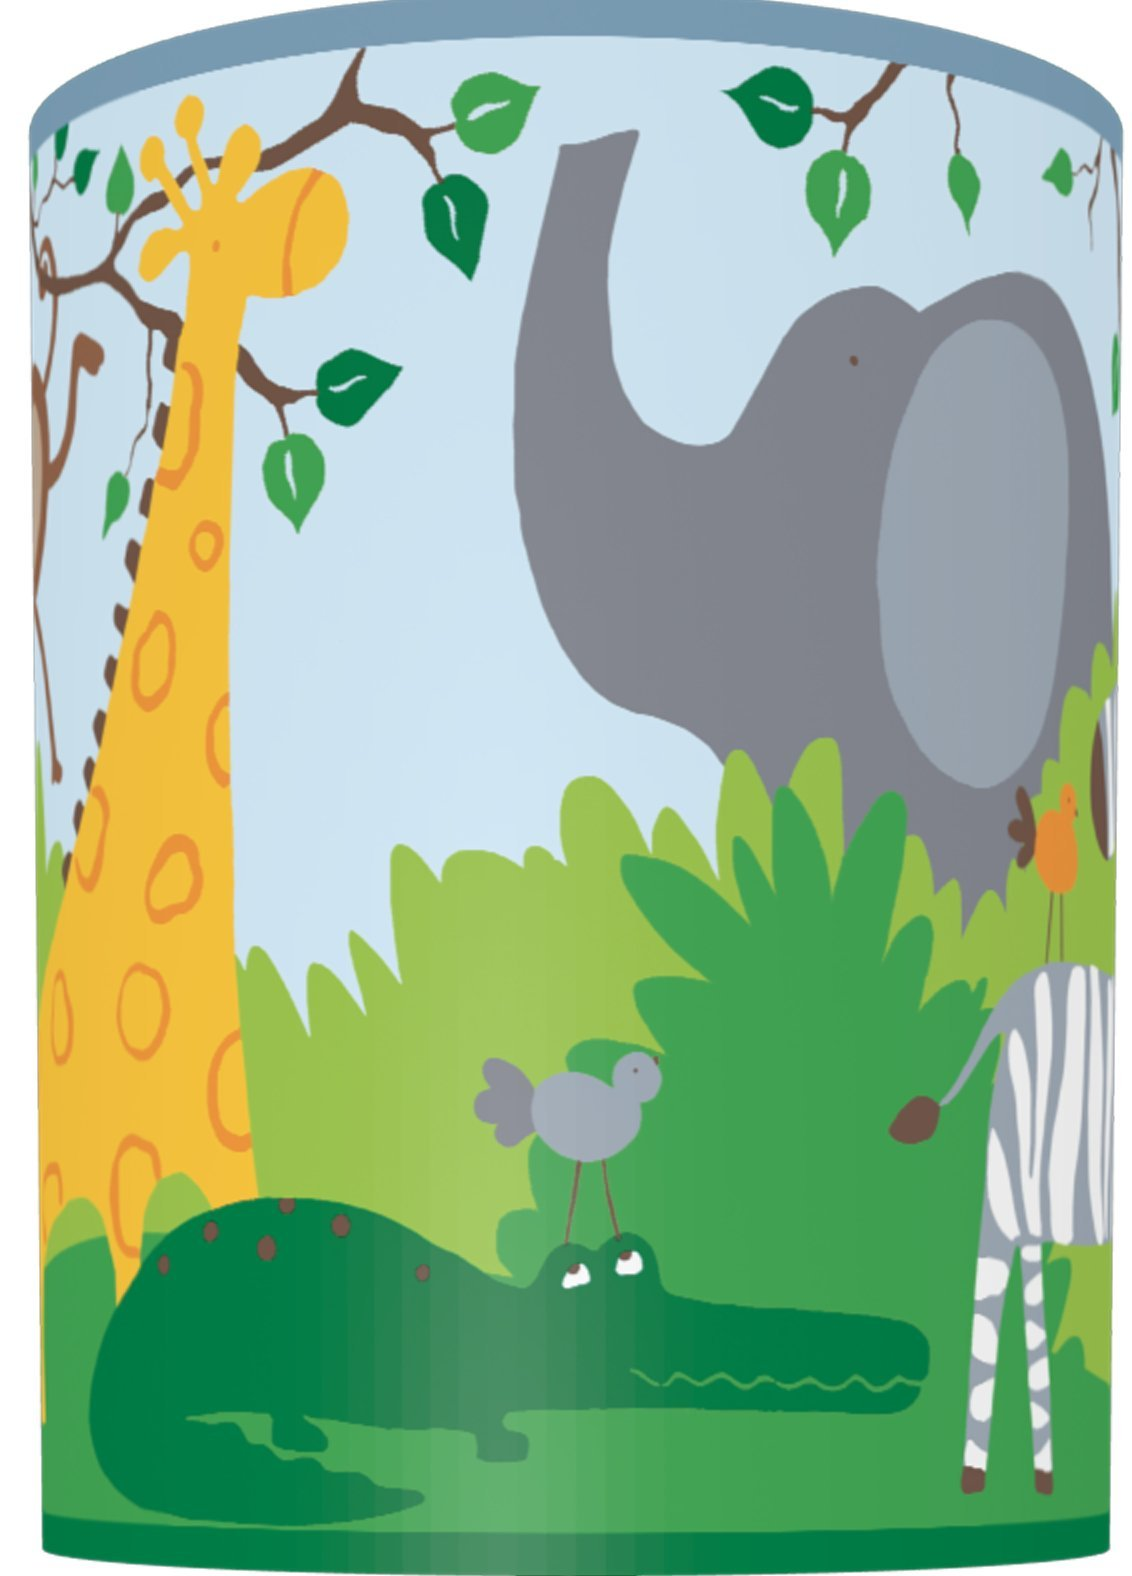 Illumalite Designs Zoo Animals Shade, 7-Inch